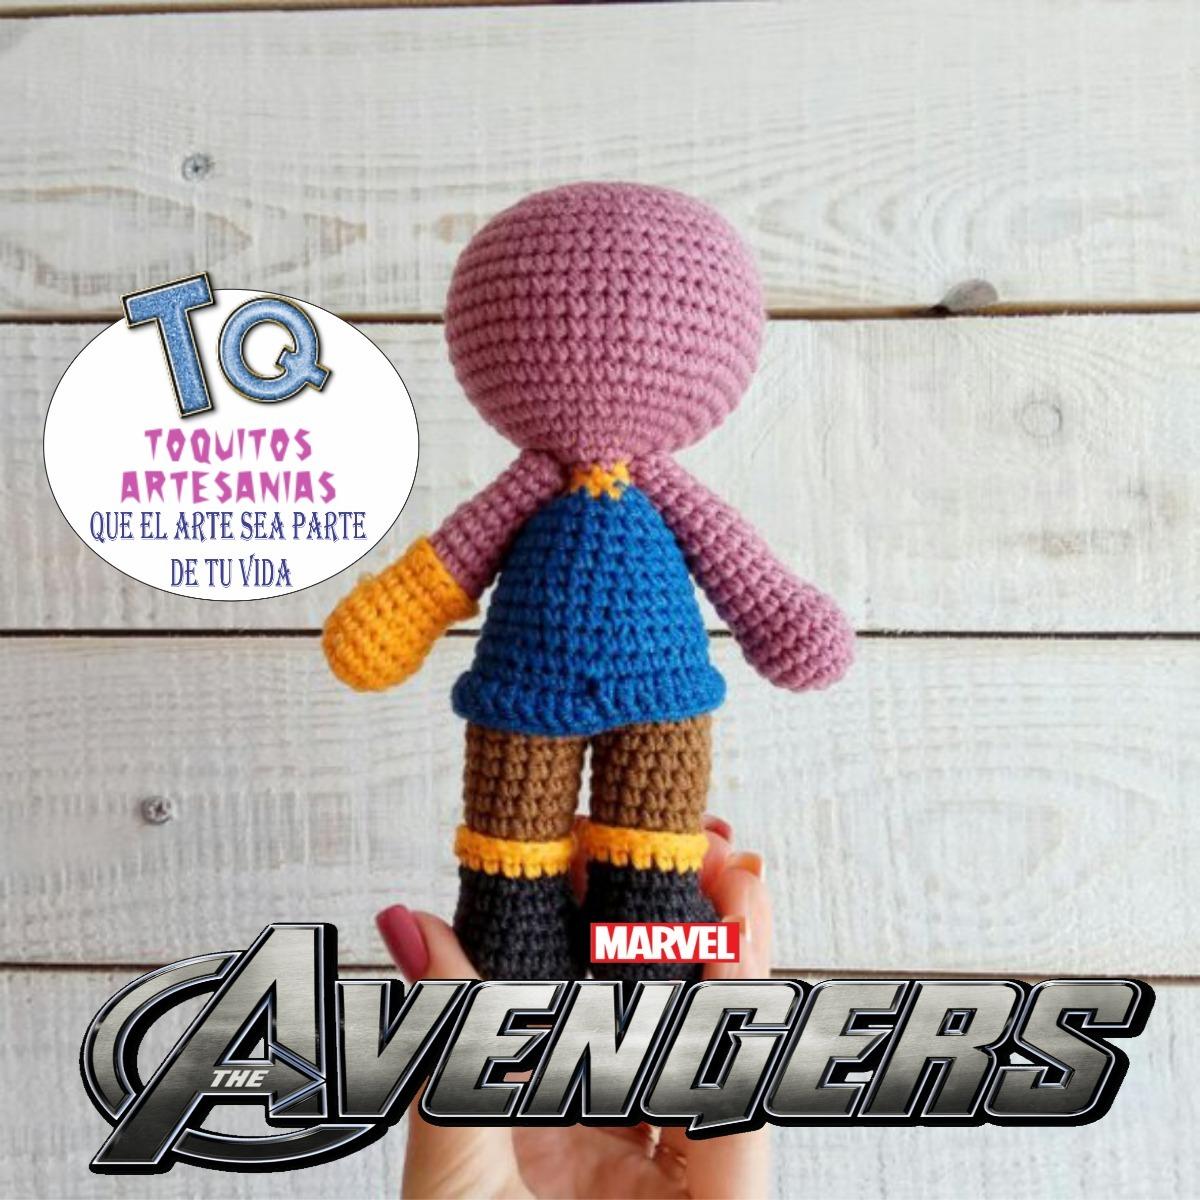 Thanos crochet amigurumi avengers infinity war by VictoriaYevl on ... | 1200x1200